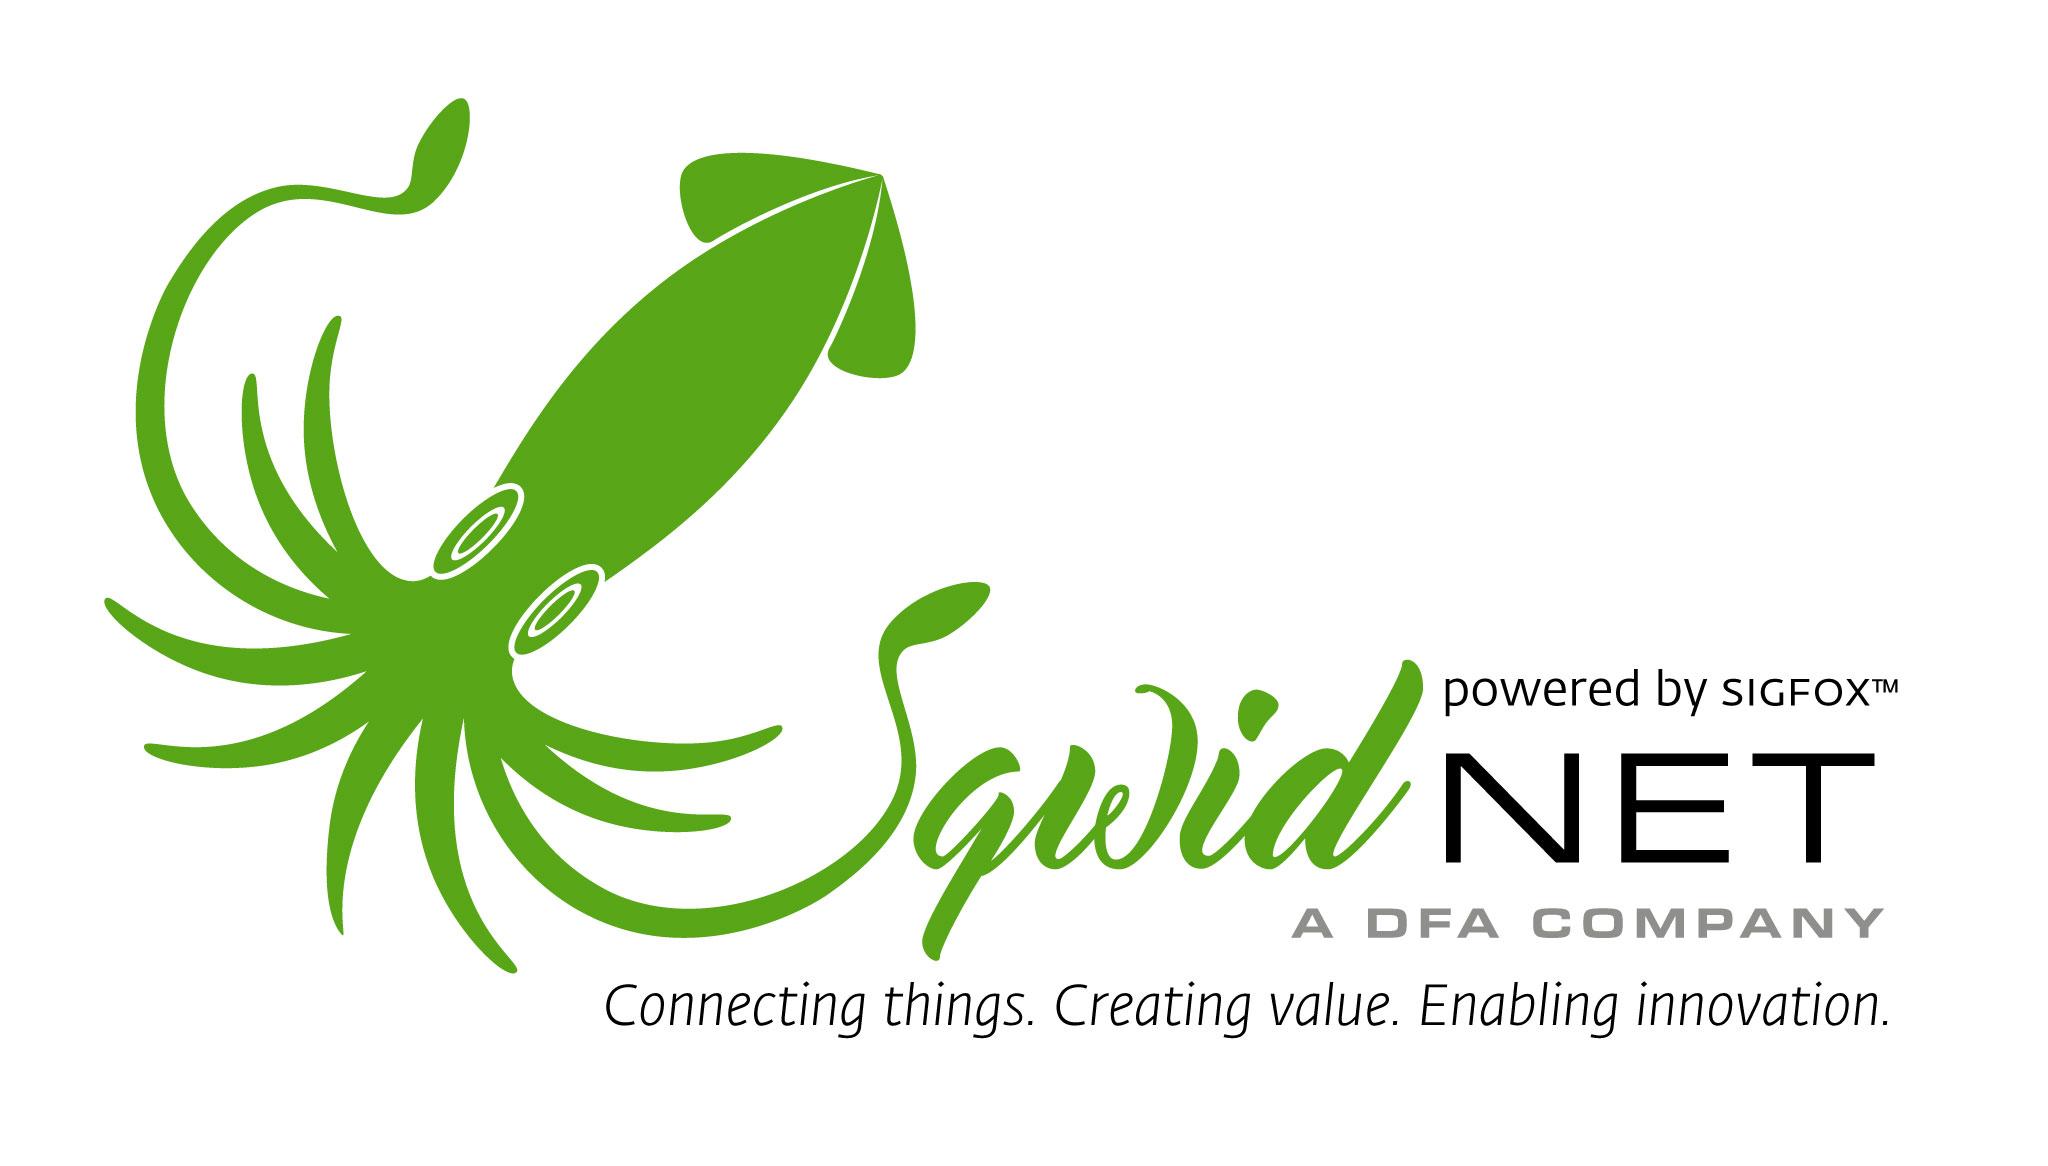 Squidnet IoT South Africa Logo